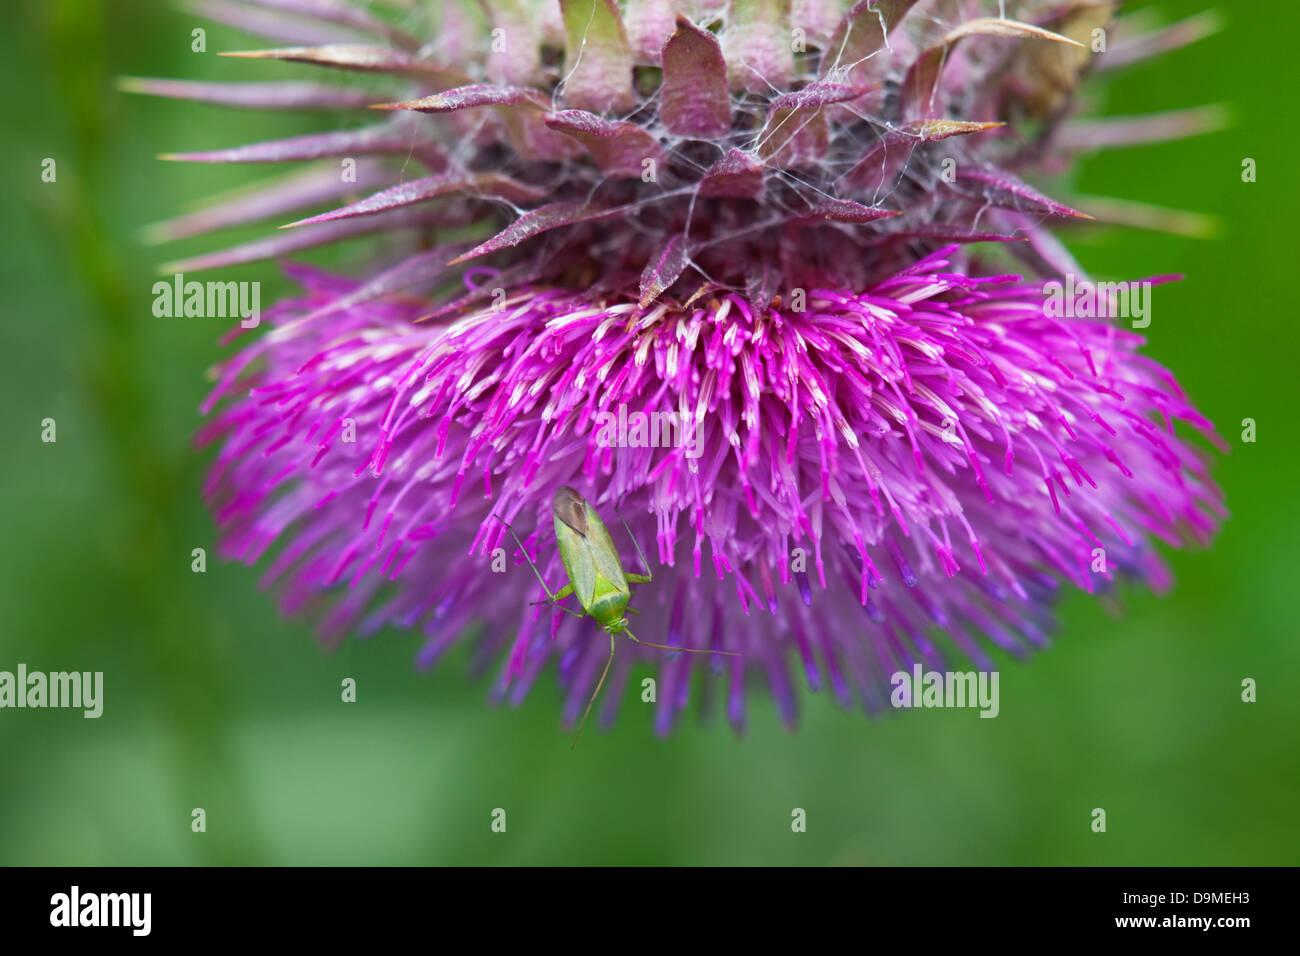 Common Green Capsid Lygocoris pabulinus bug on a Musk Thistle Carduus nutans flower - Stock Image